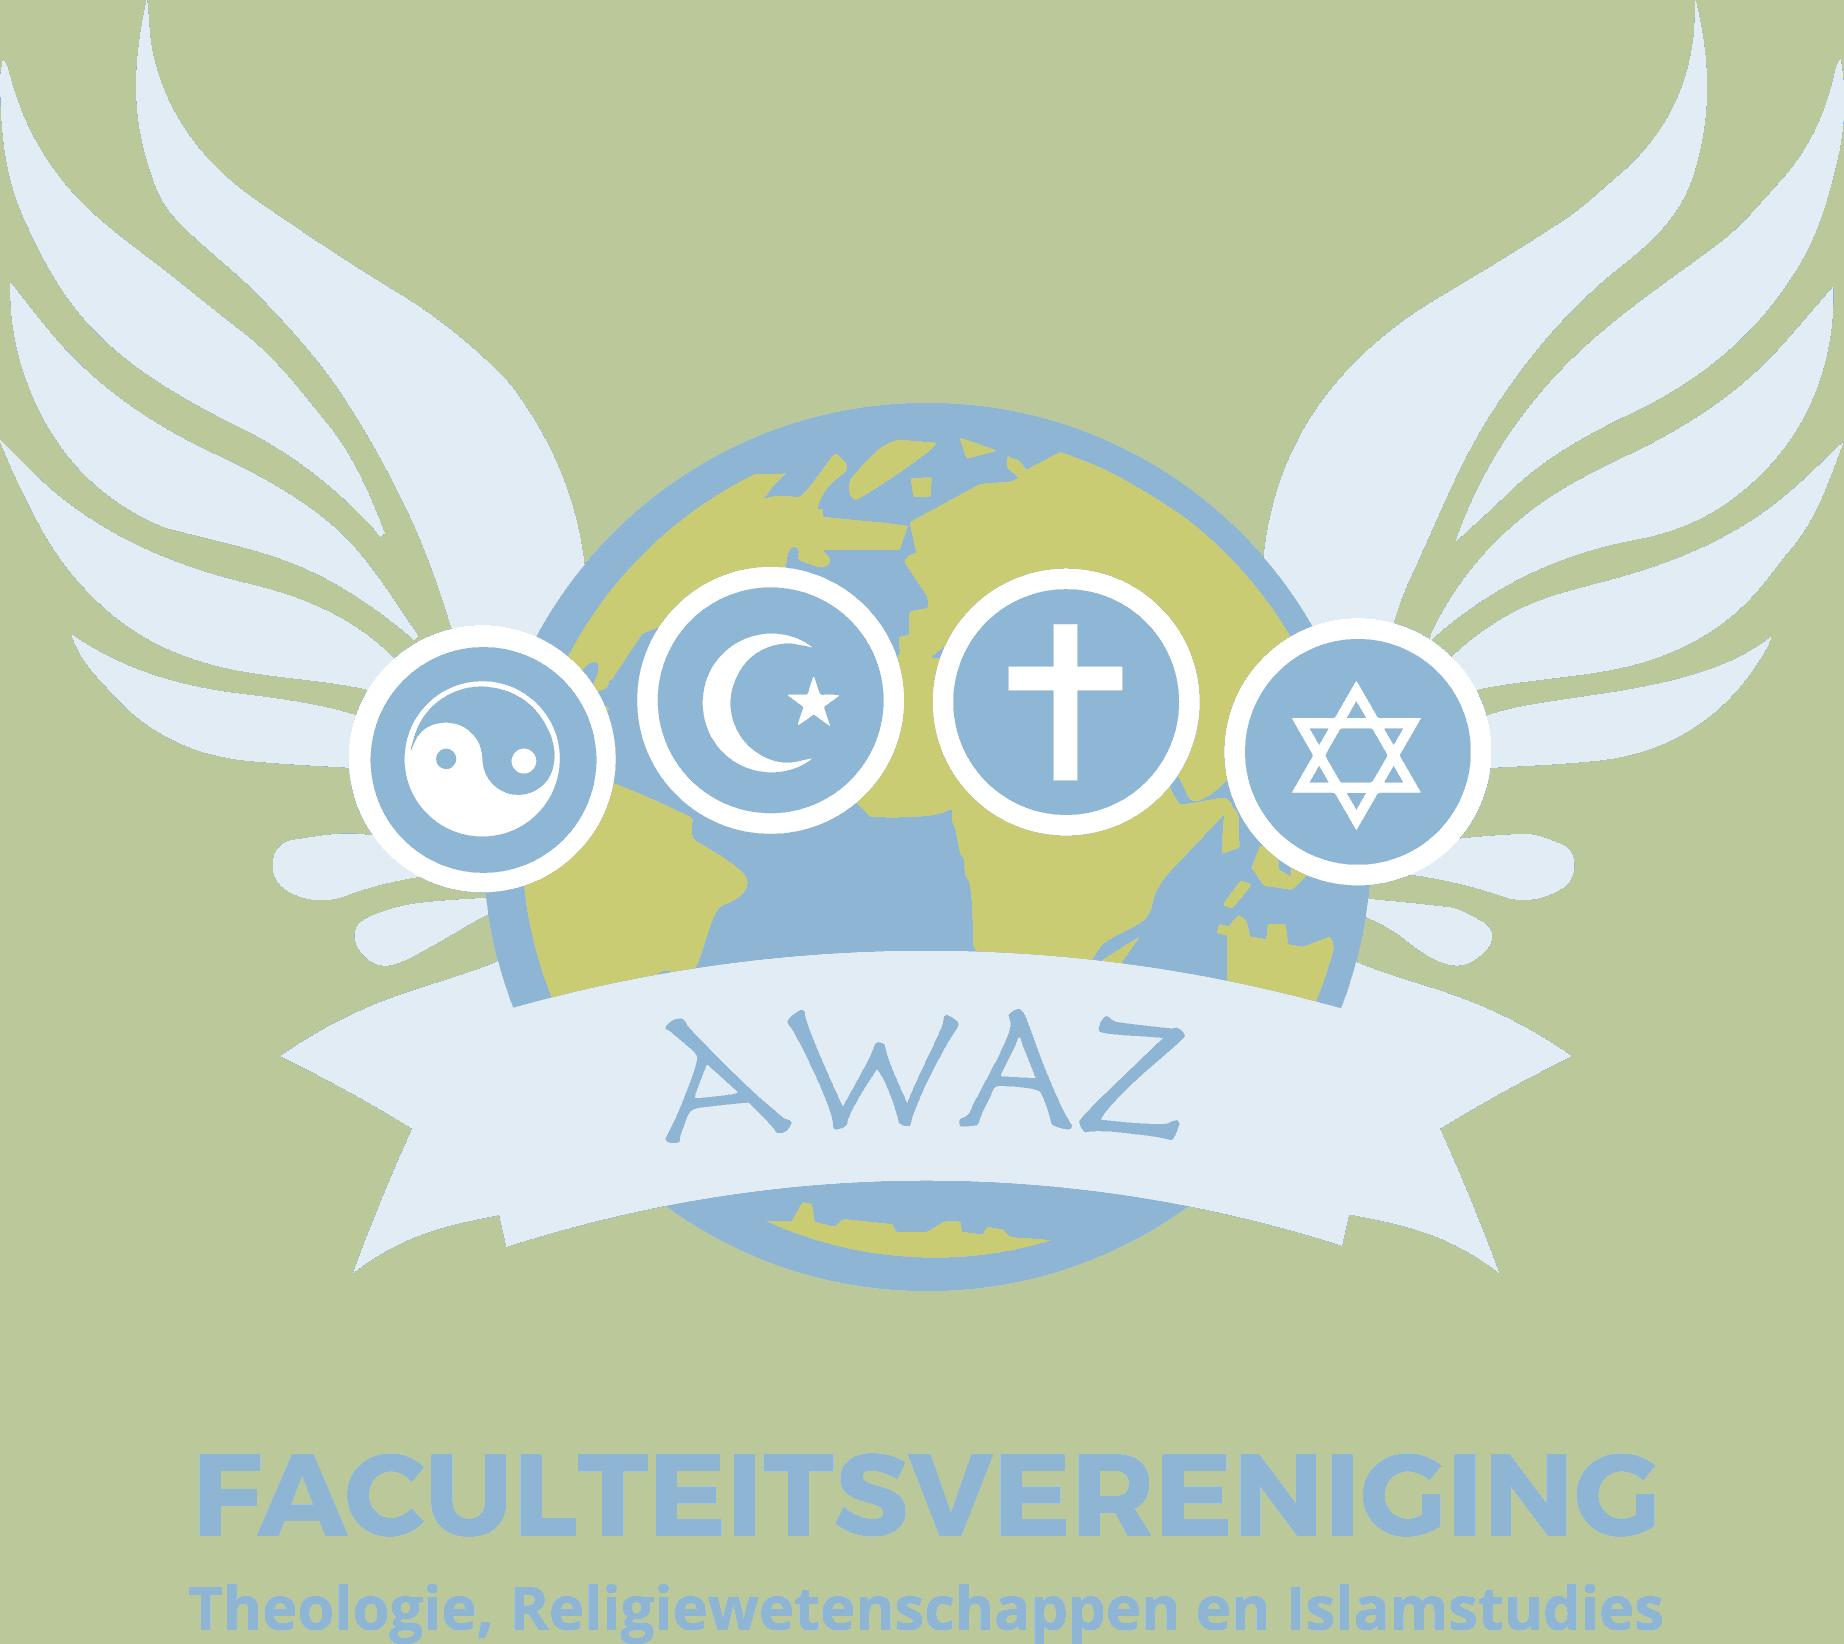 Faculteitsvereniging Awaz